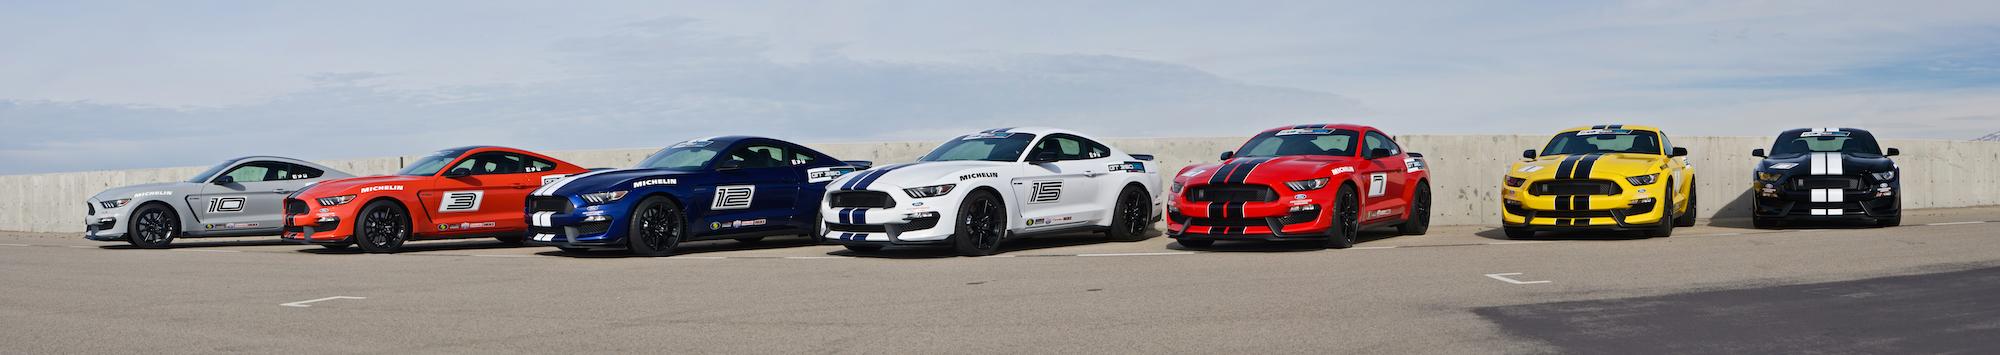 GT350R Race School - GT350 Track Attack